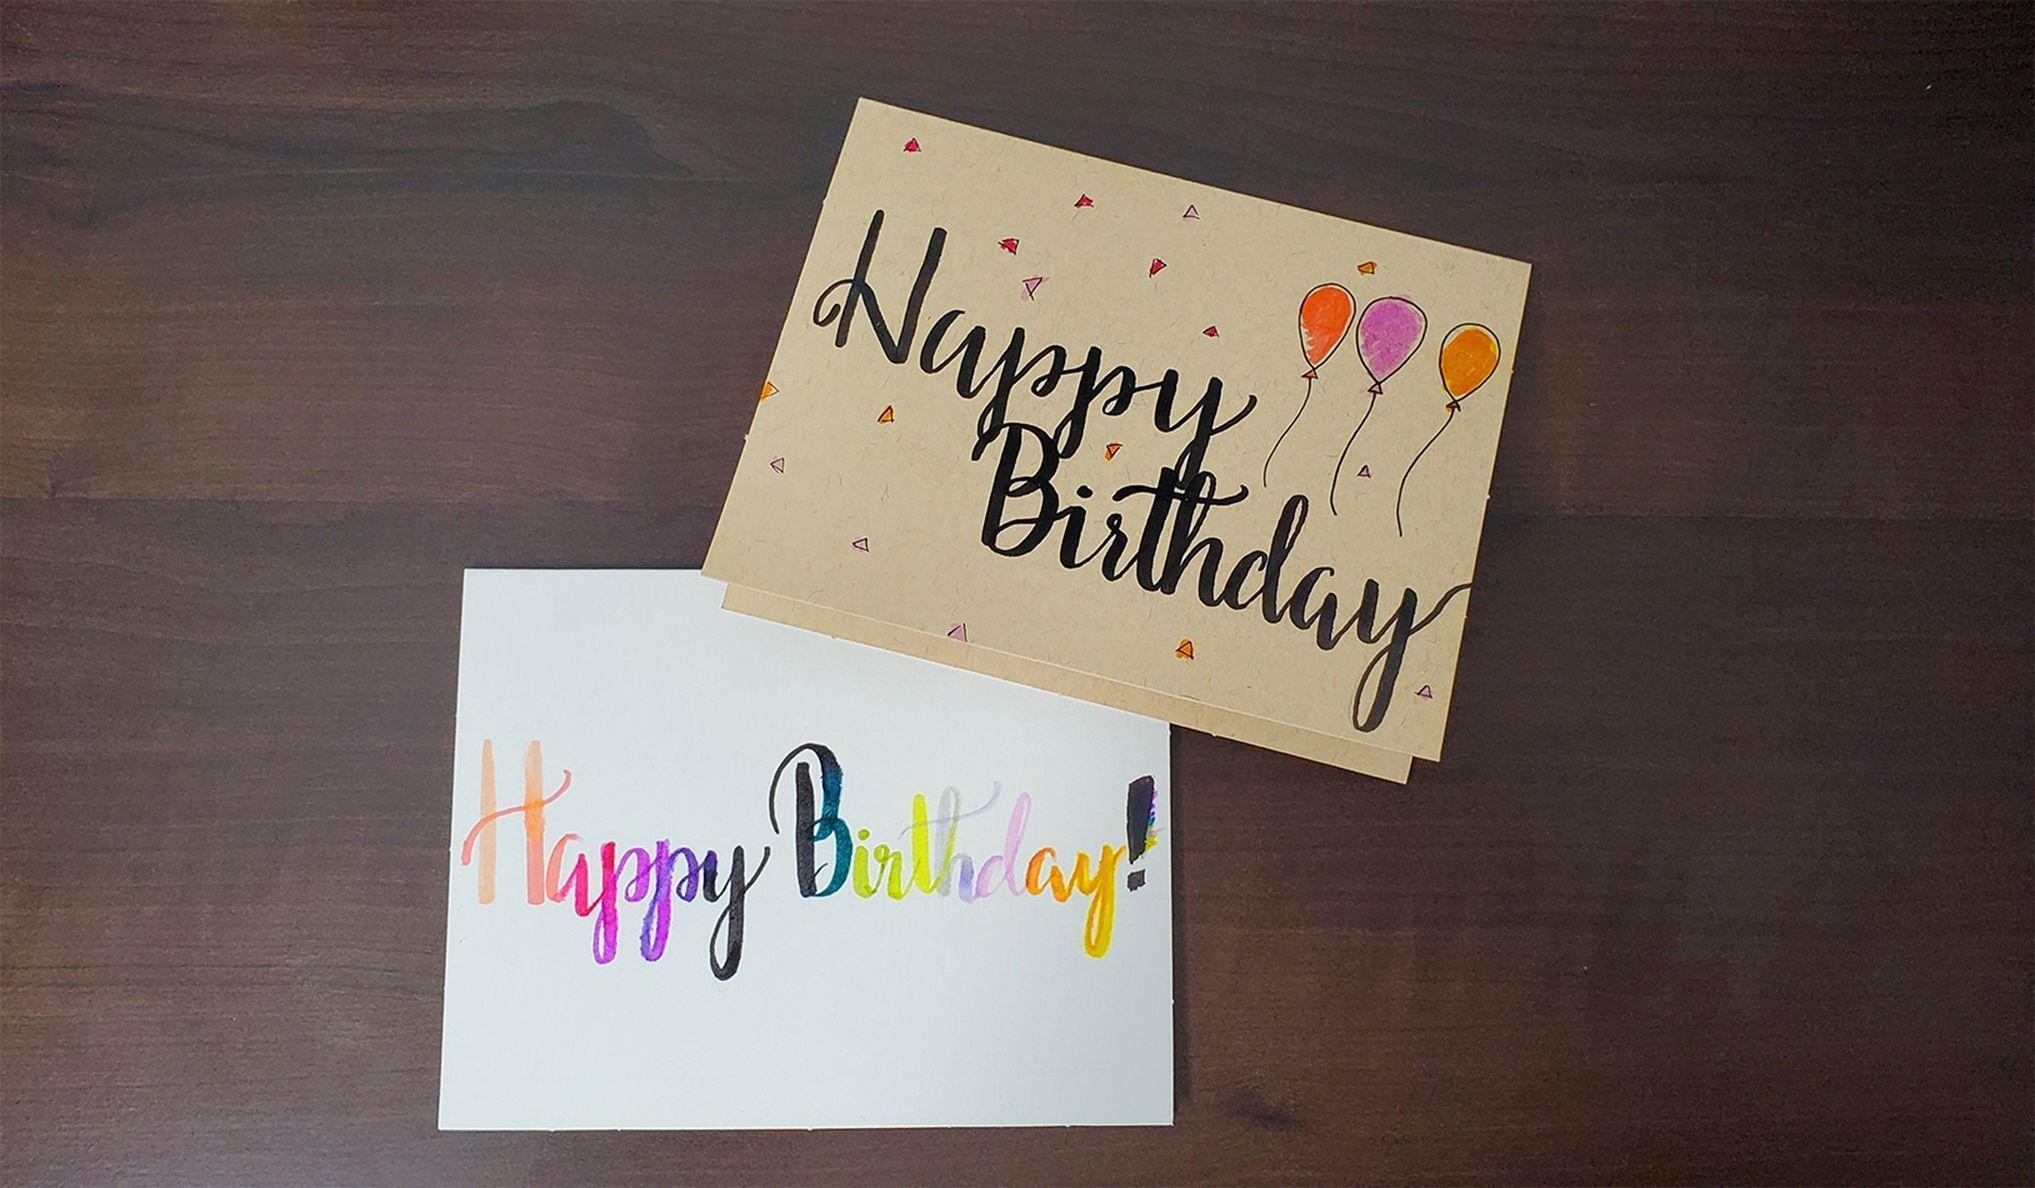 Birthday Cards 18thbirthdaycards 21stbirthdaycards 50thbirthdaycards Birt 18thbirthdaycards 21 18th Birthday Cards Birthday Cards Diy Birthday Cards